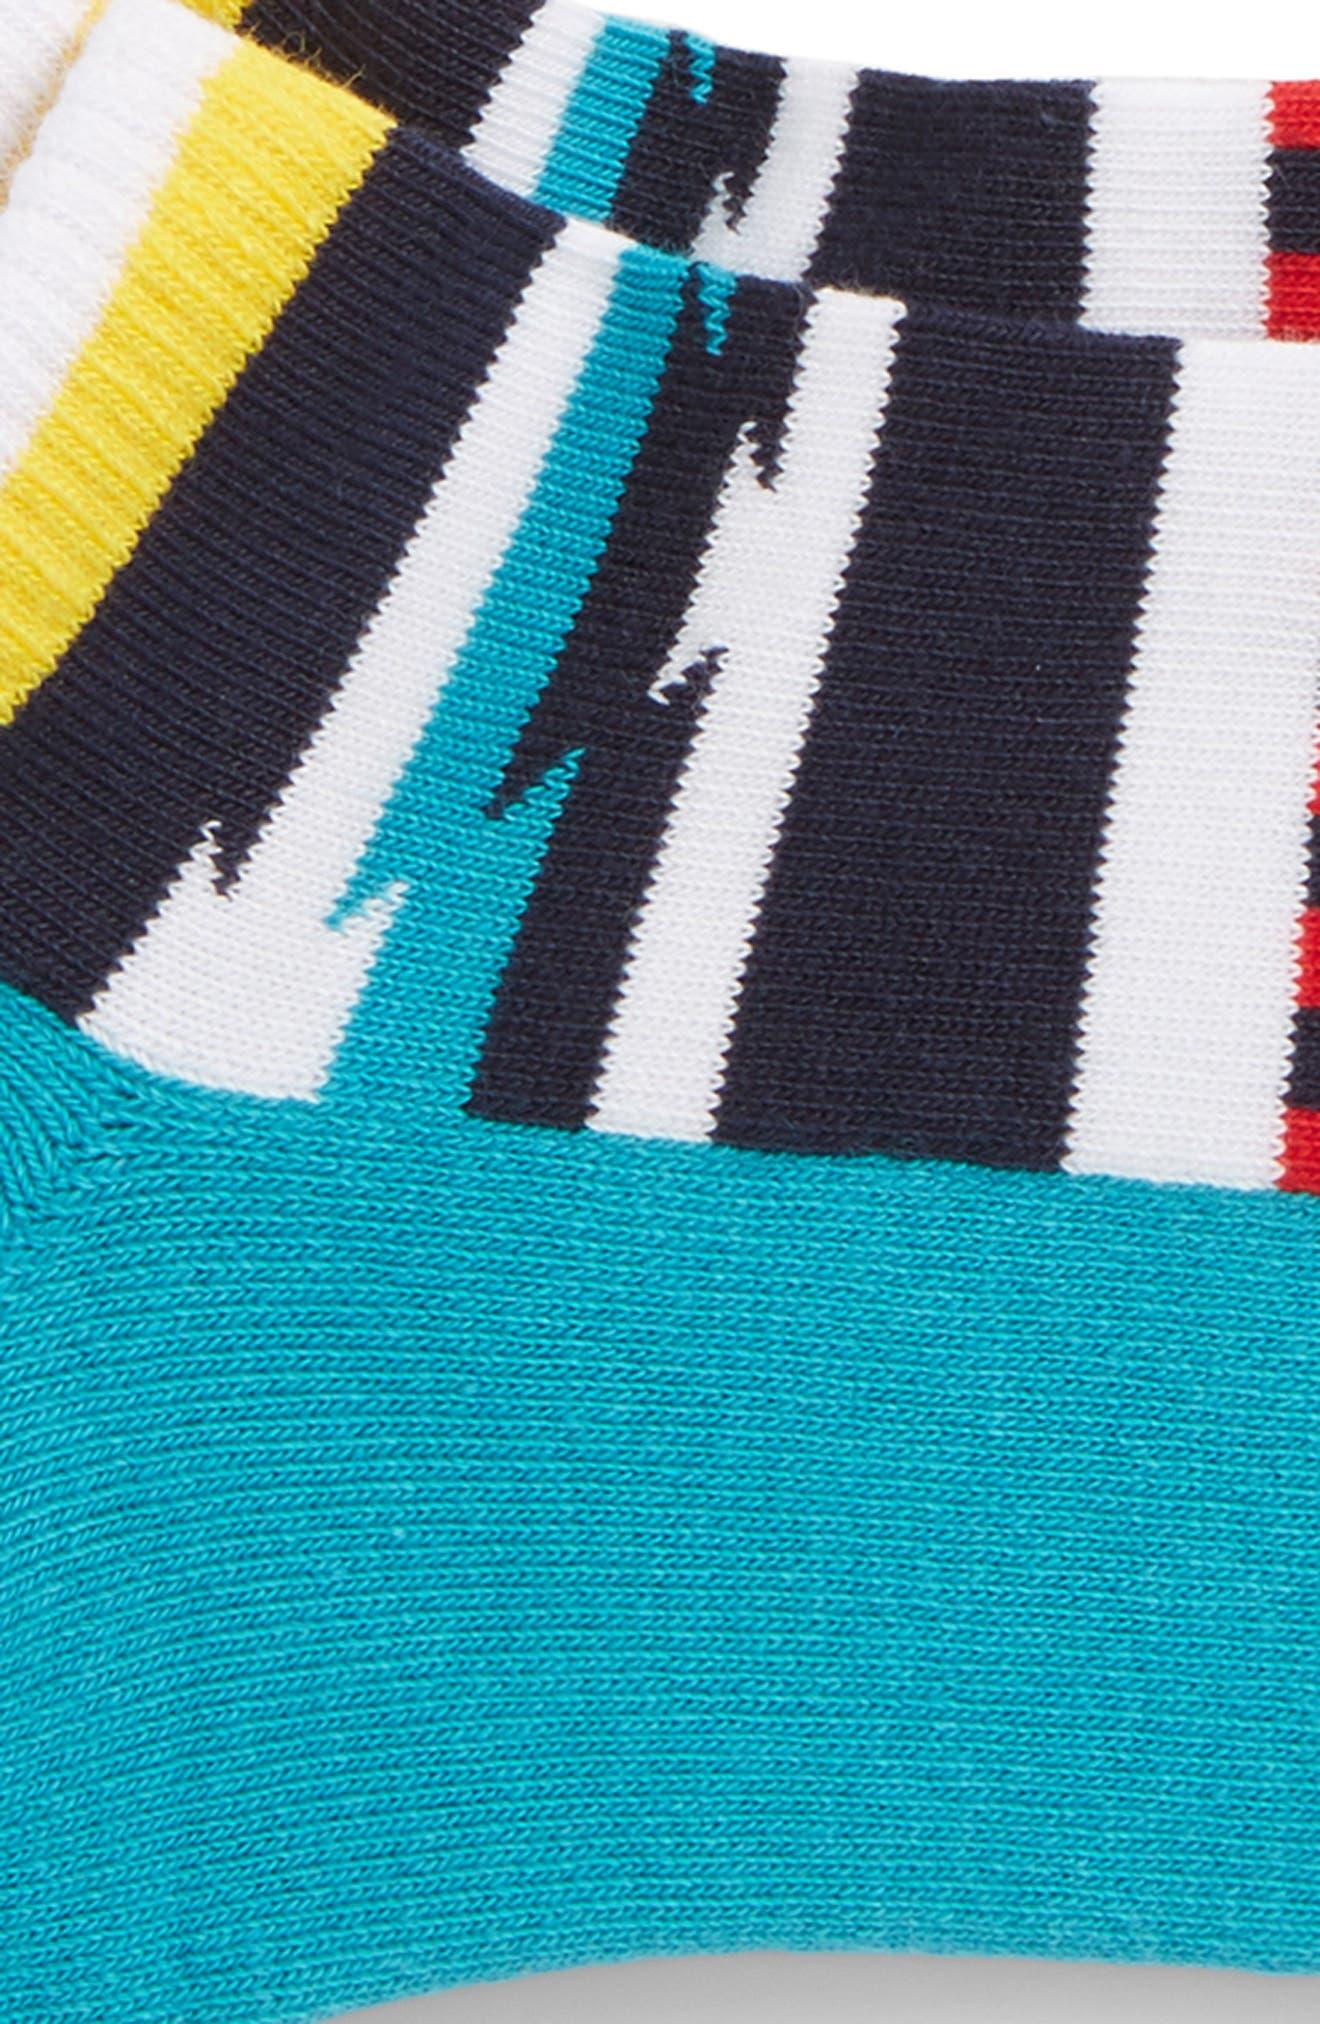 Stripe Low Cut Socks,                             Alternate thumbnail 2, color,                             Teal Multi